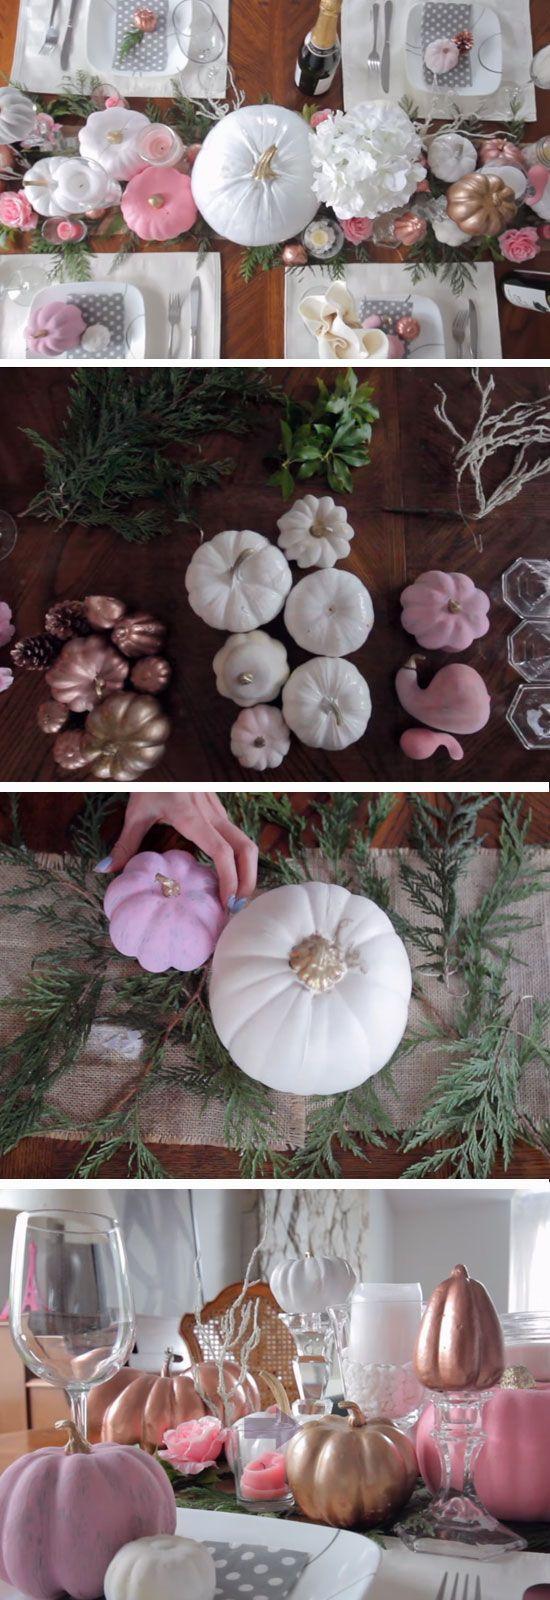 Diy halloween wedding decorations  Enchanted Forest  Easy DIY Fall Wedding Decorations on a Budget